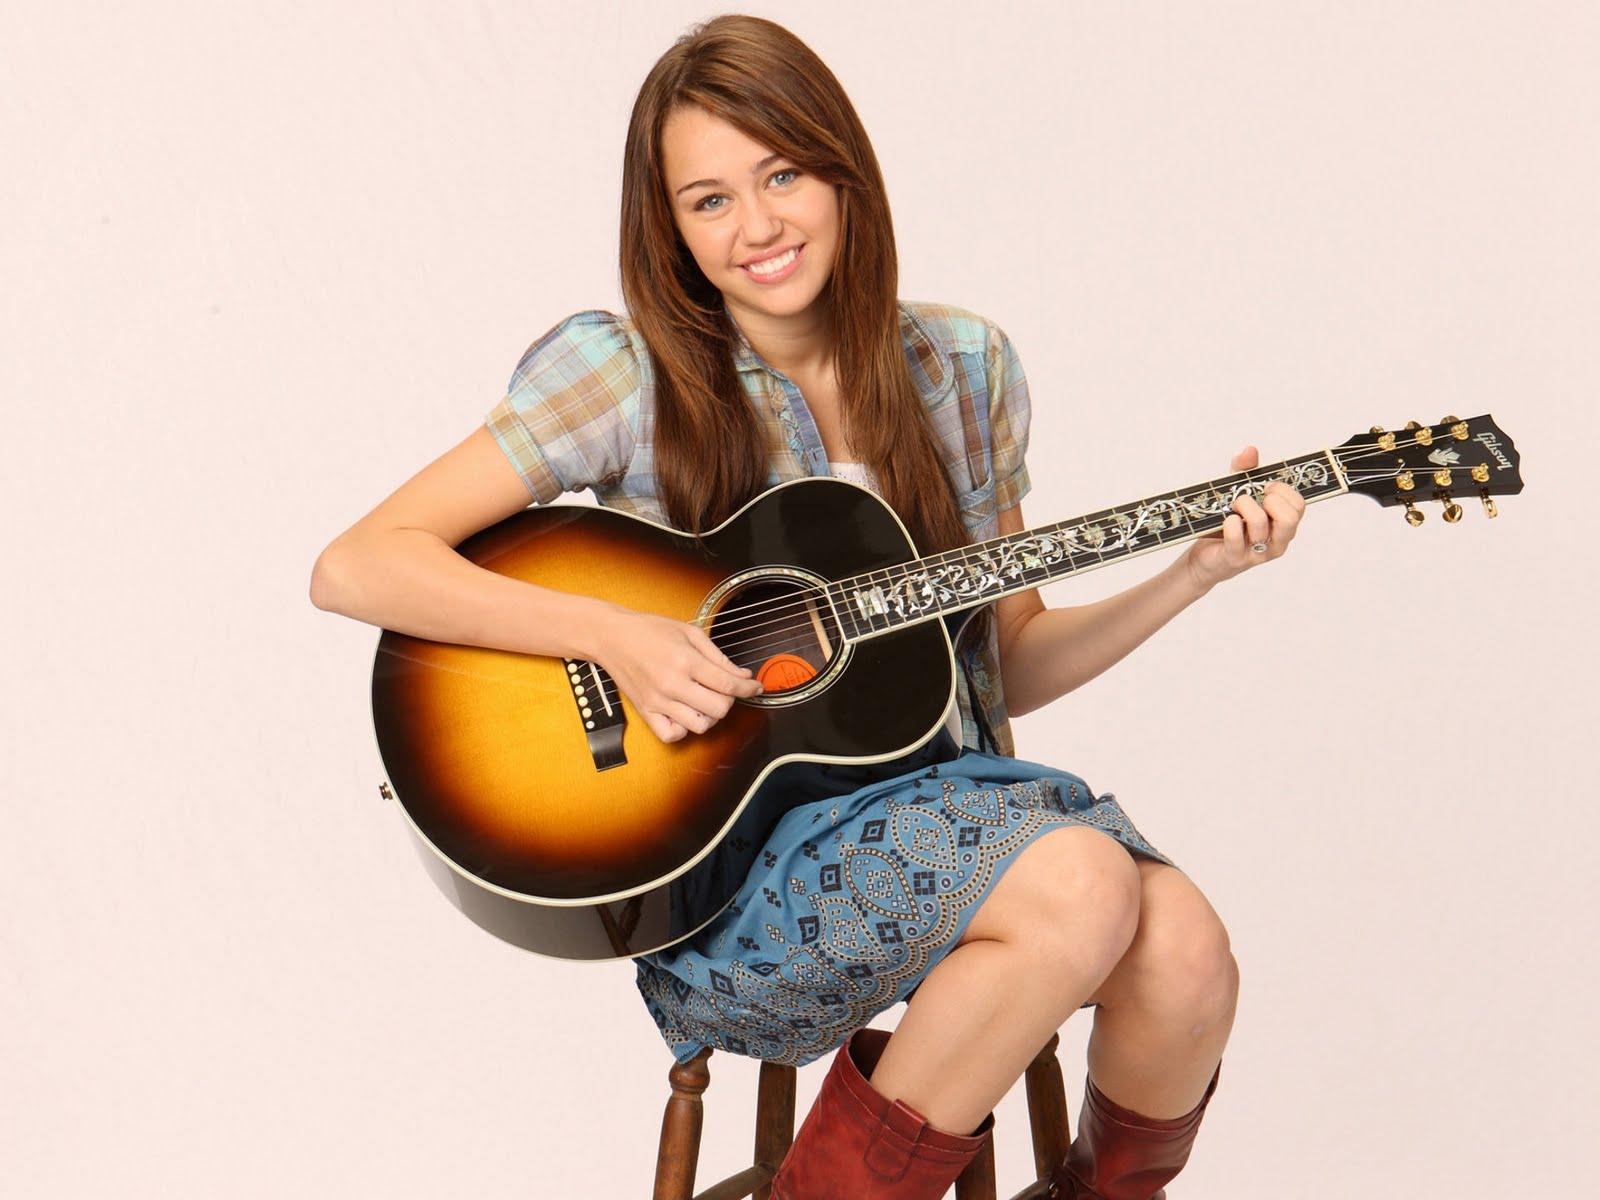 http://3.bp.blogspot.com/_6QURoNy4-5k/TOrNaBPSl4I/AAAAAAAAIlA/E_N-i0ENgjM/s1600/Miley-Cyrus.jpg